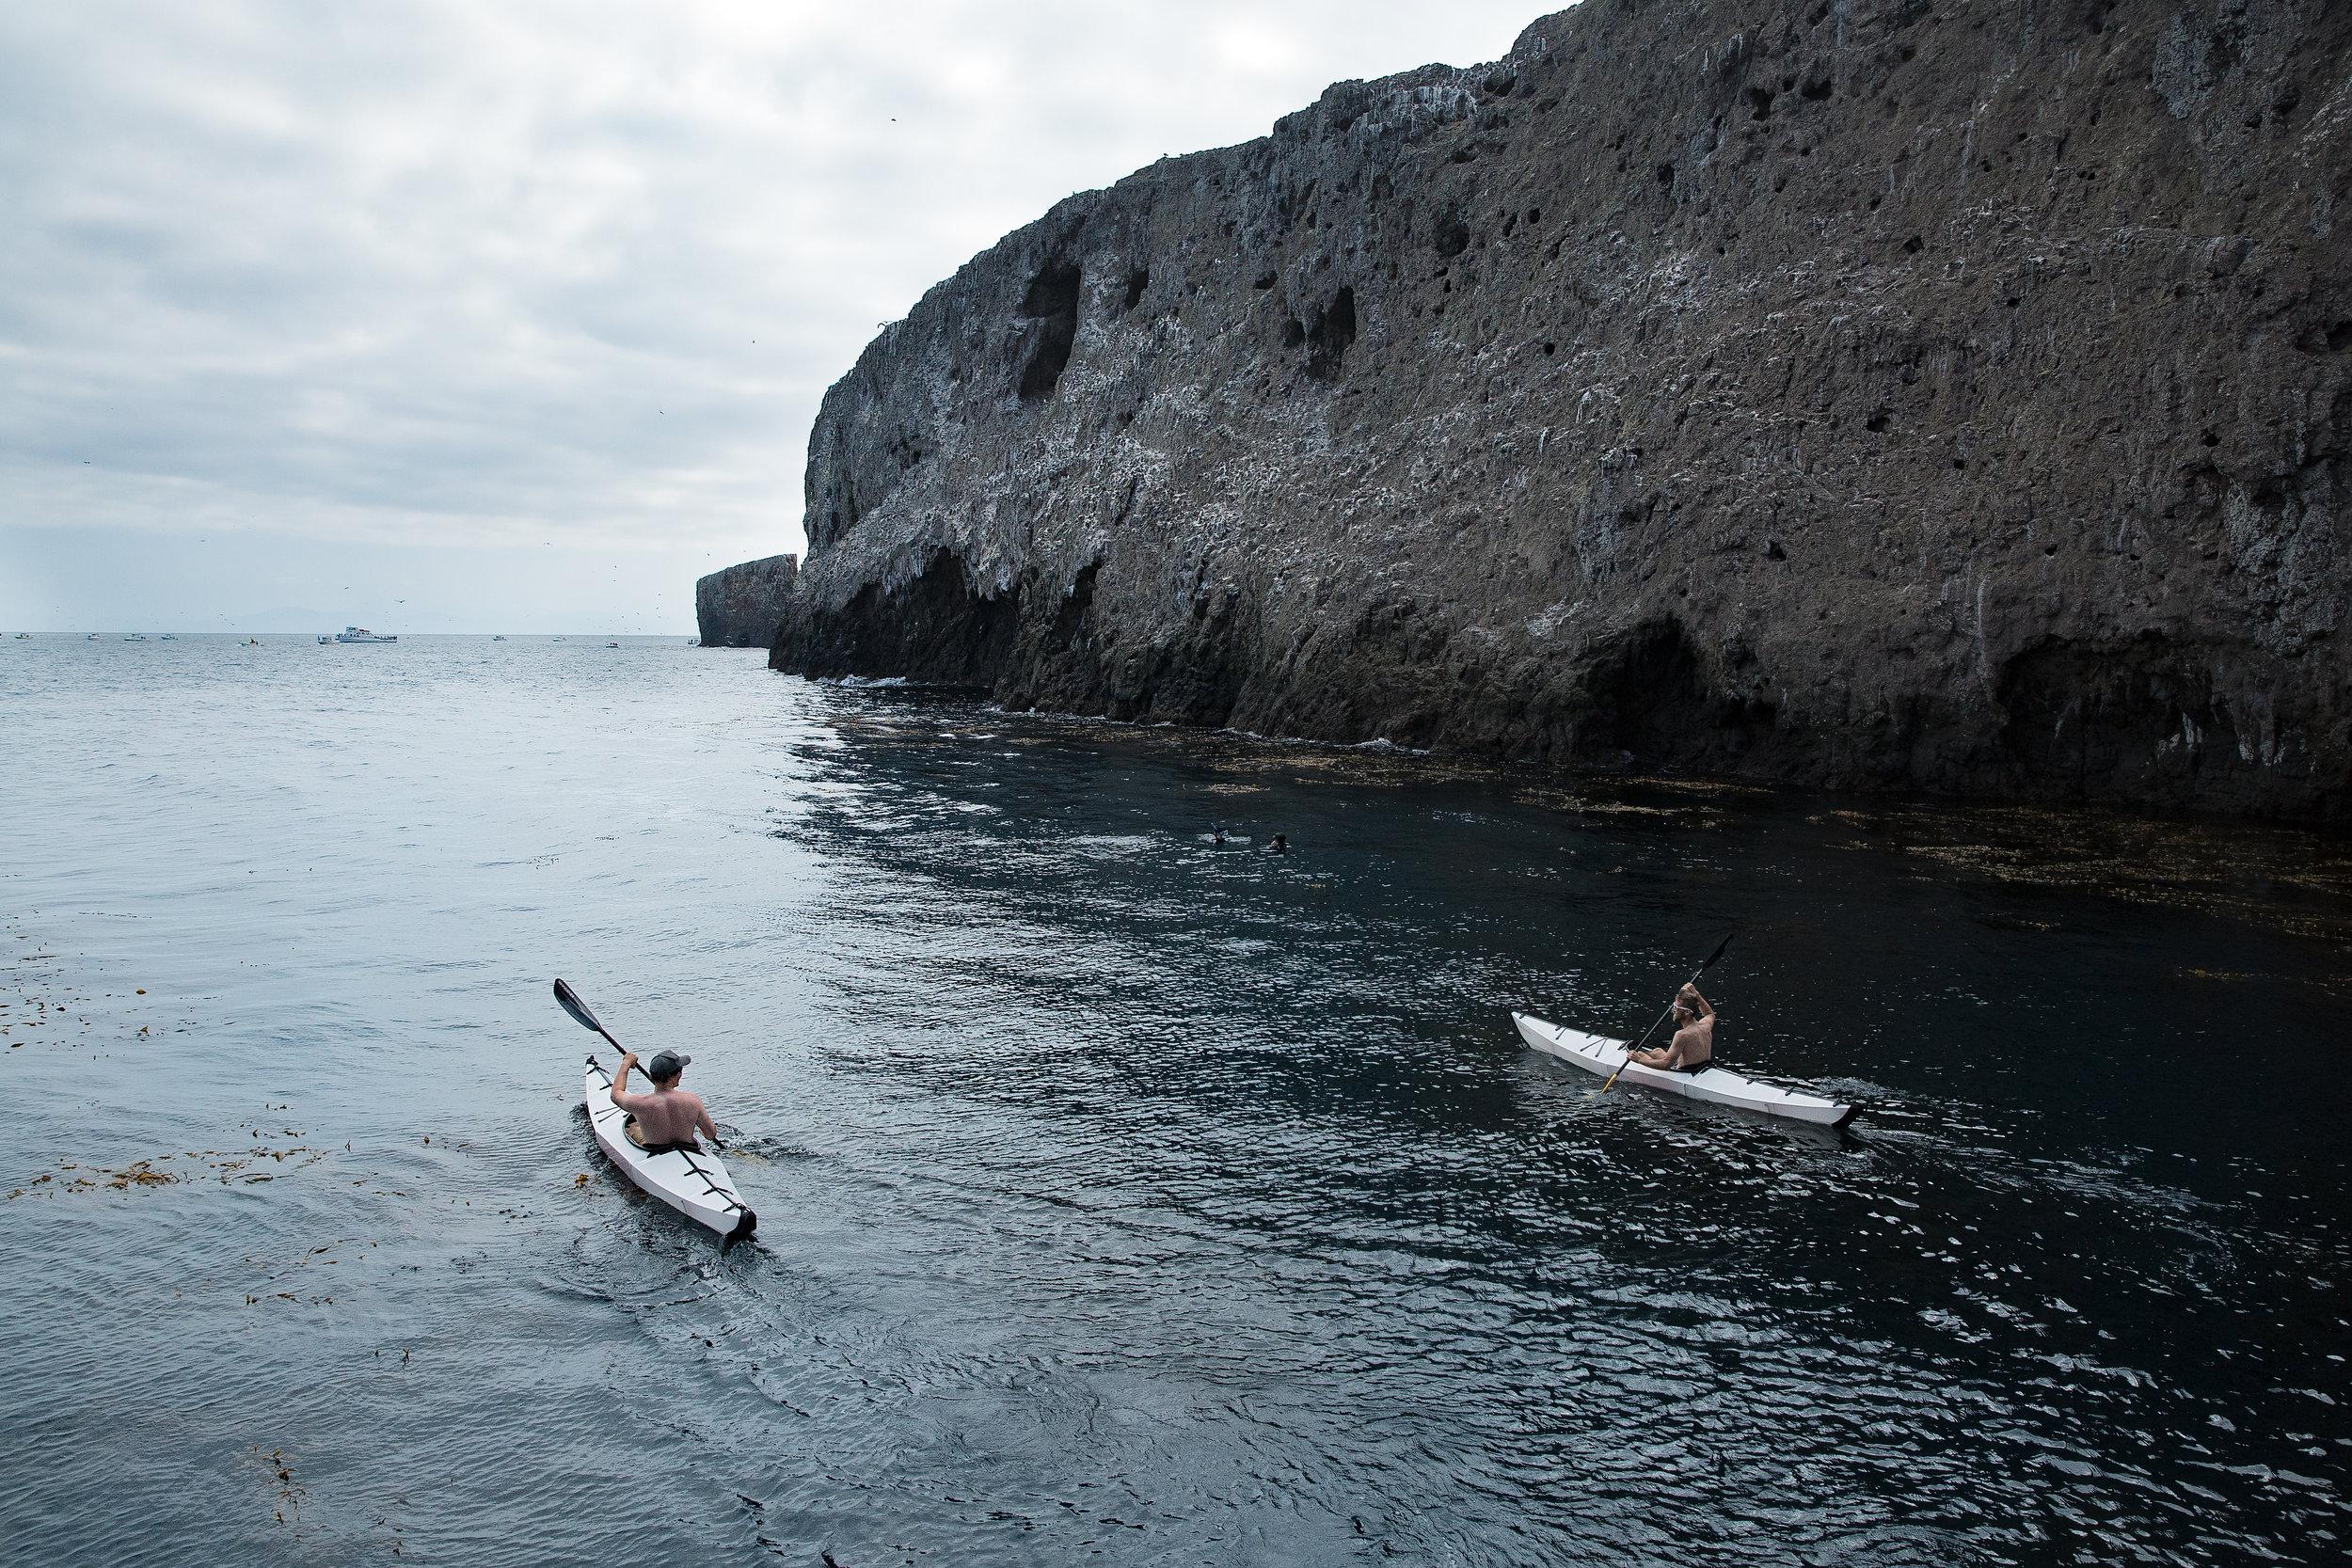 Saturday morning sea kayaking in the Orus.